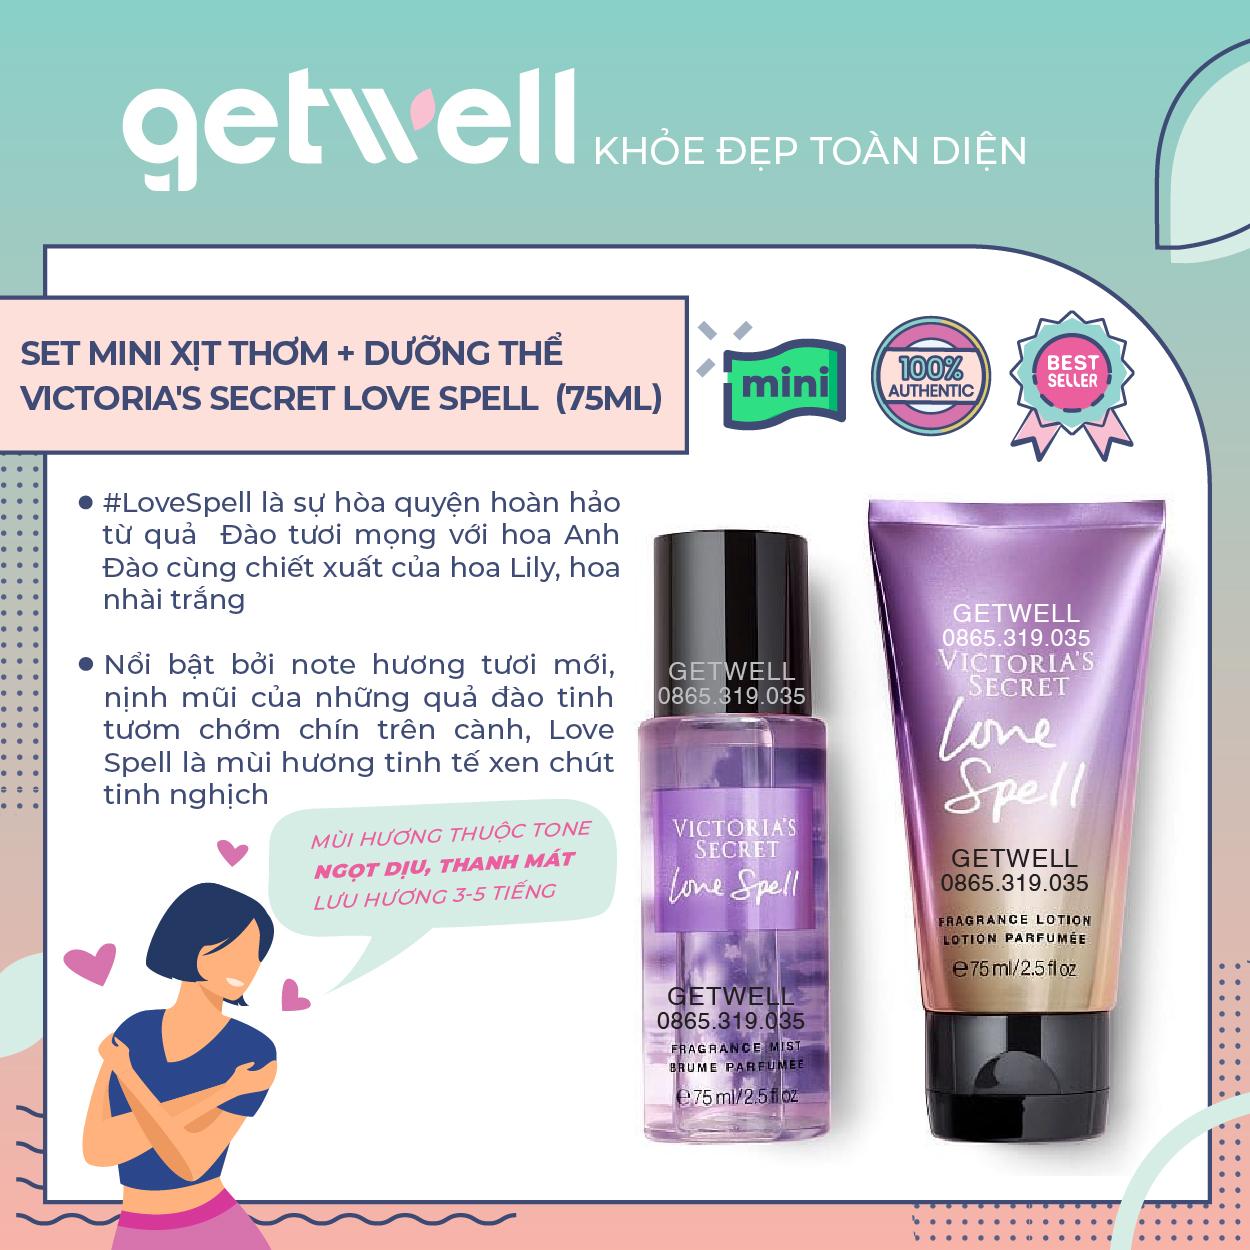 Set Xịt thơm + Dưỡng thể Victoria's Secret Mini Fragrance Mist & Lotion Giftset Love Spell (75ml x2)